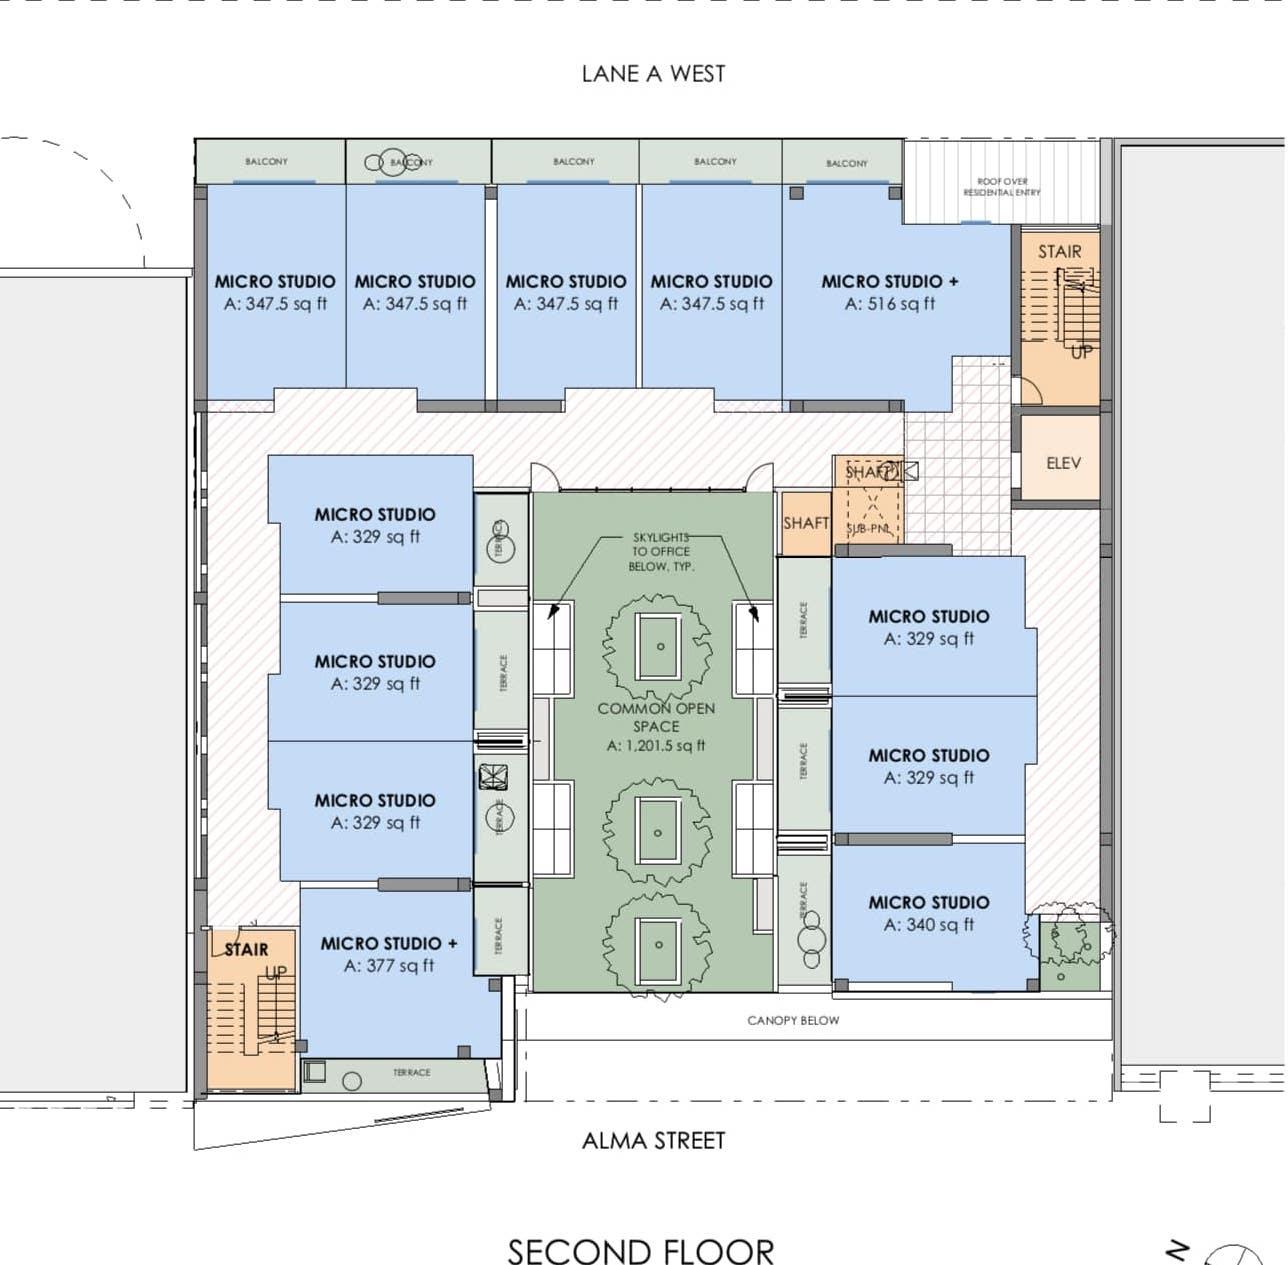 955 Alma Street, Palo Alto Second Floor Plan